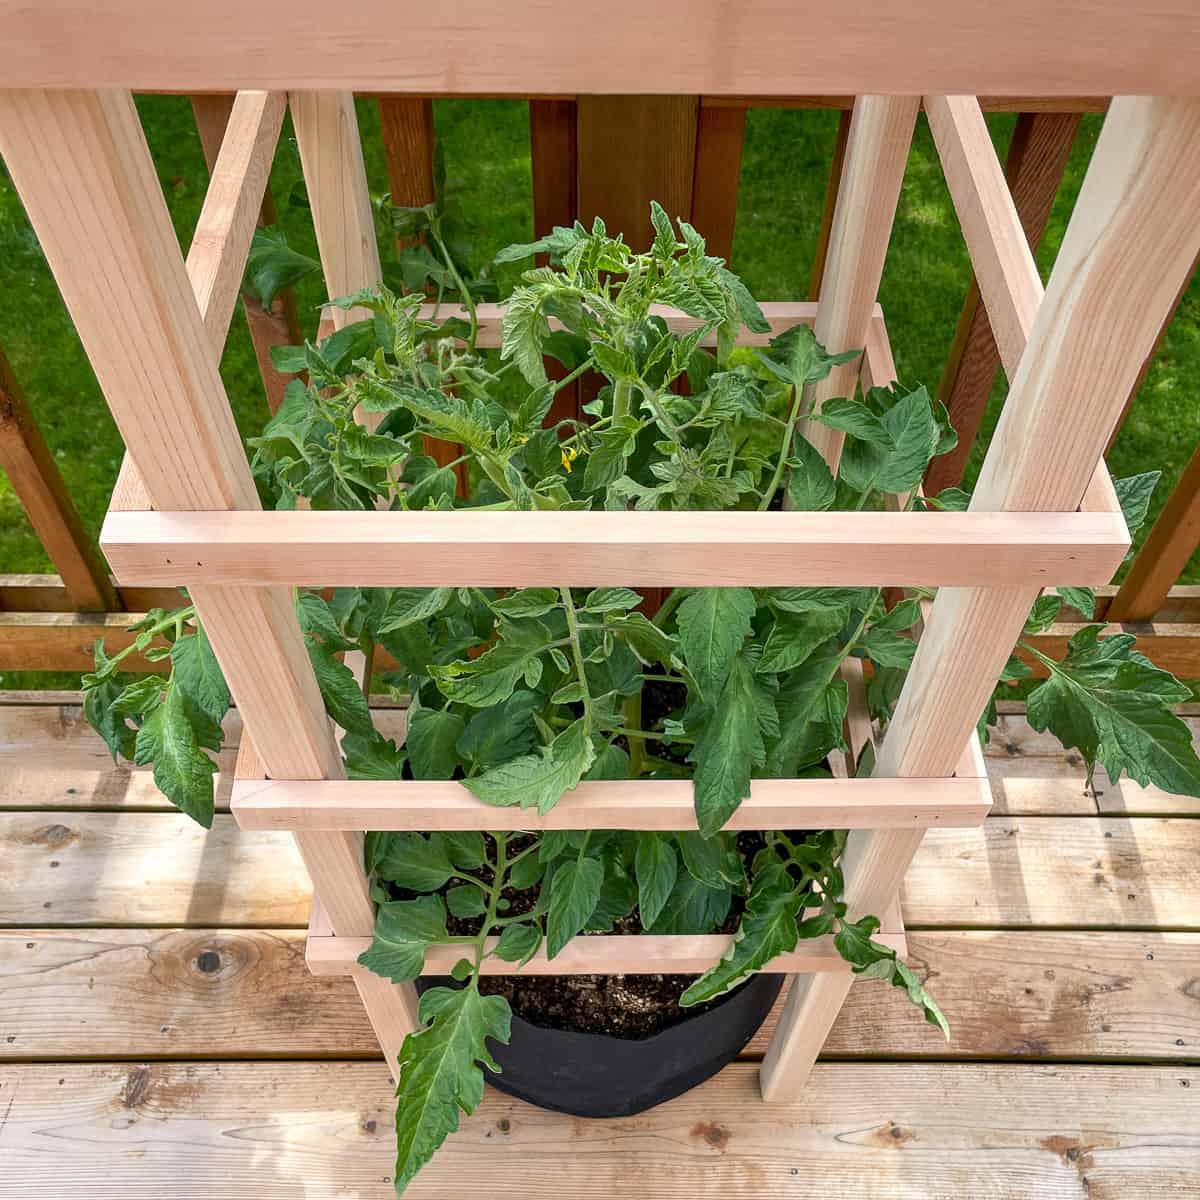 DIY tomato cage surrounding tomato plant in 10 gallon grow bag